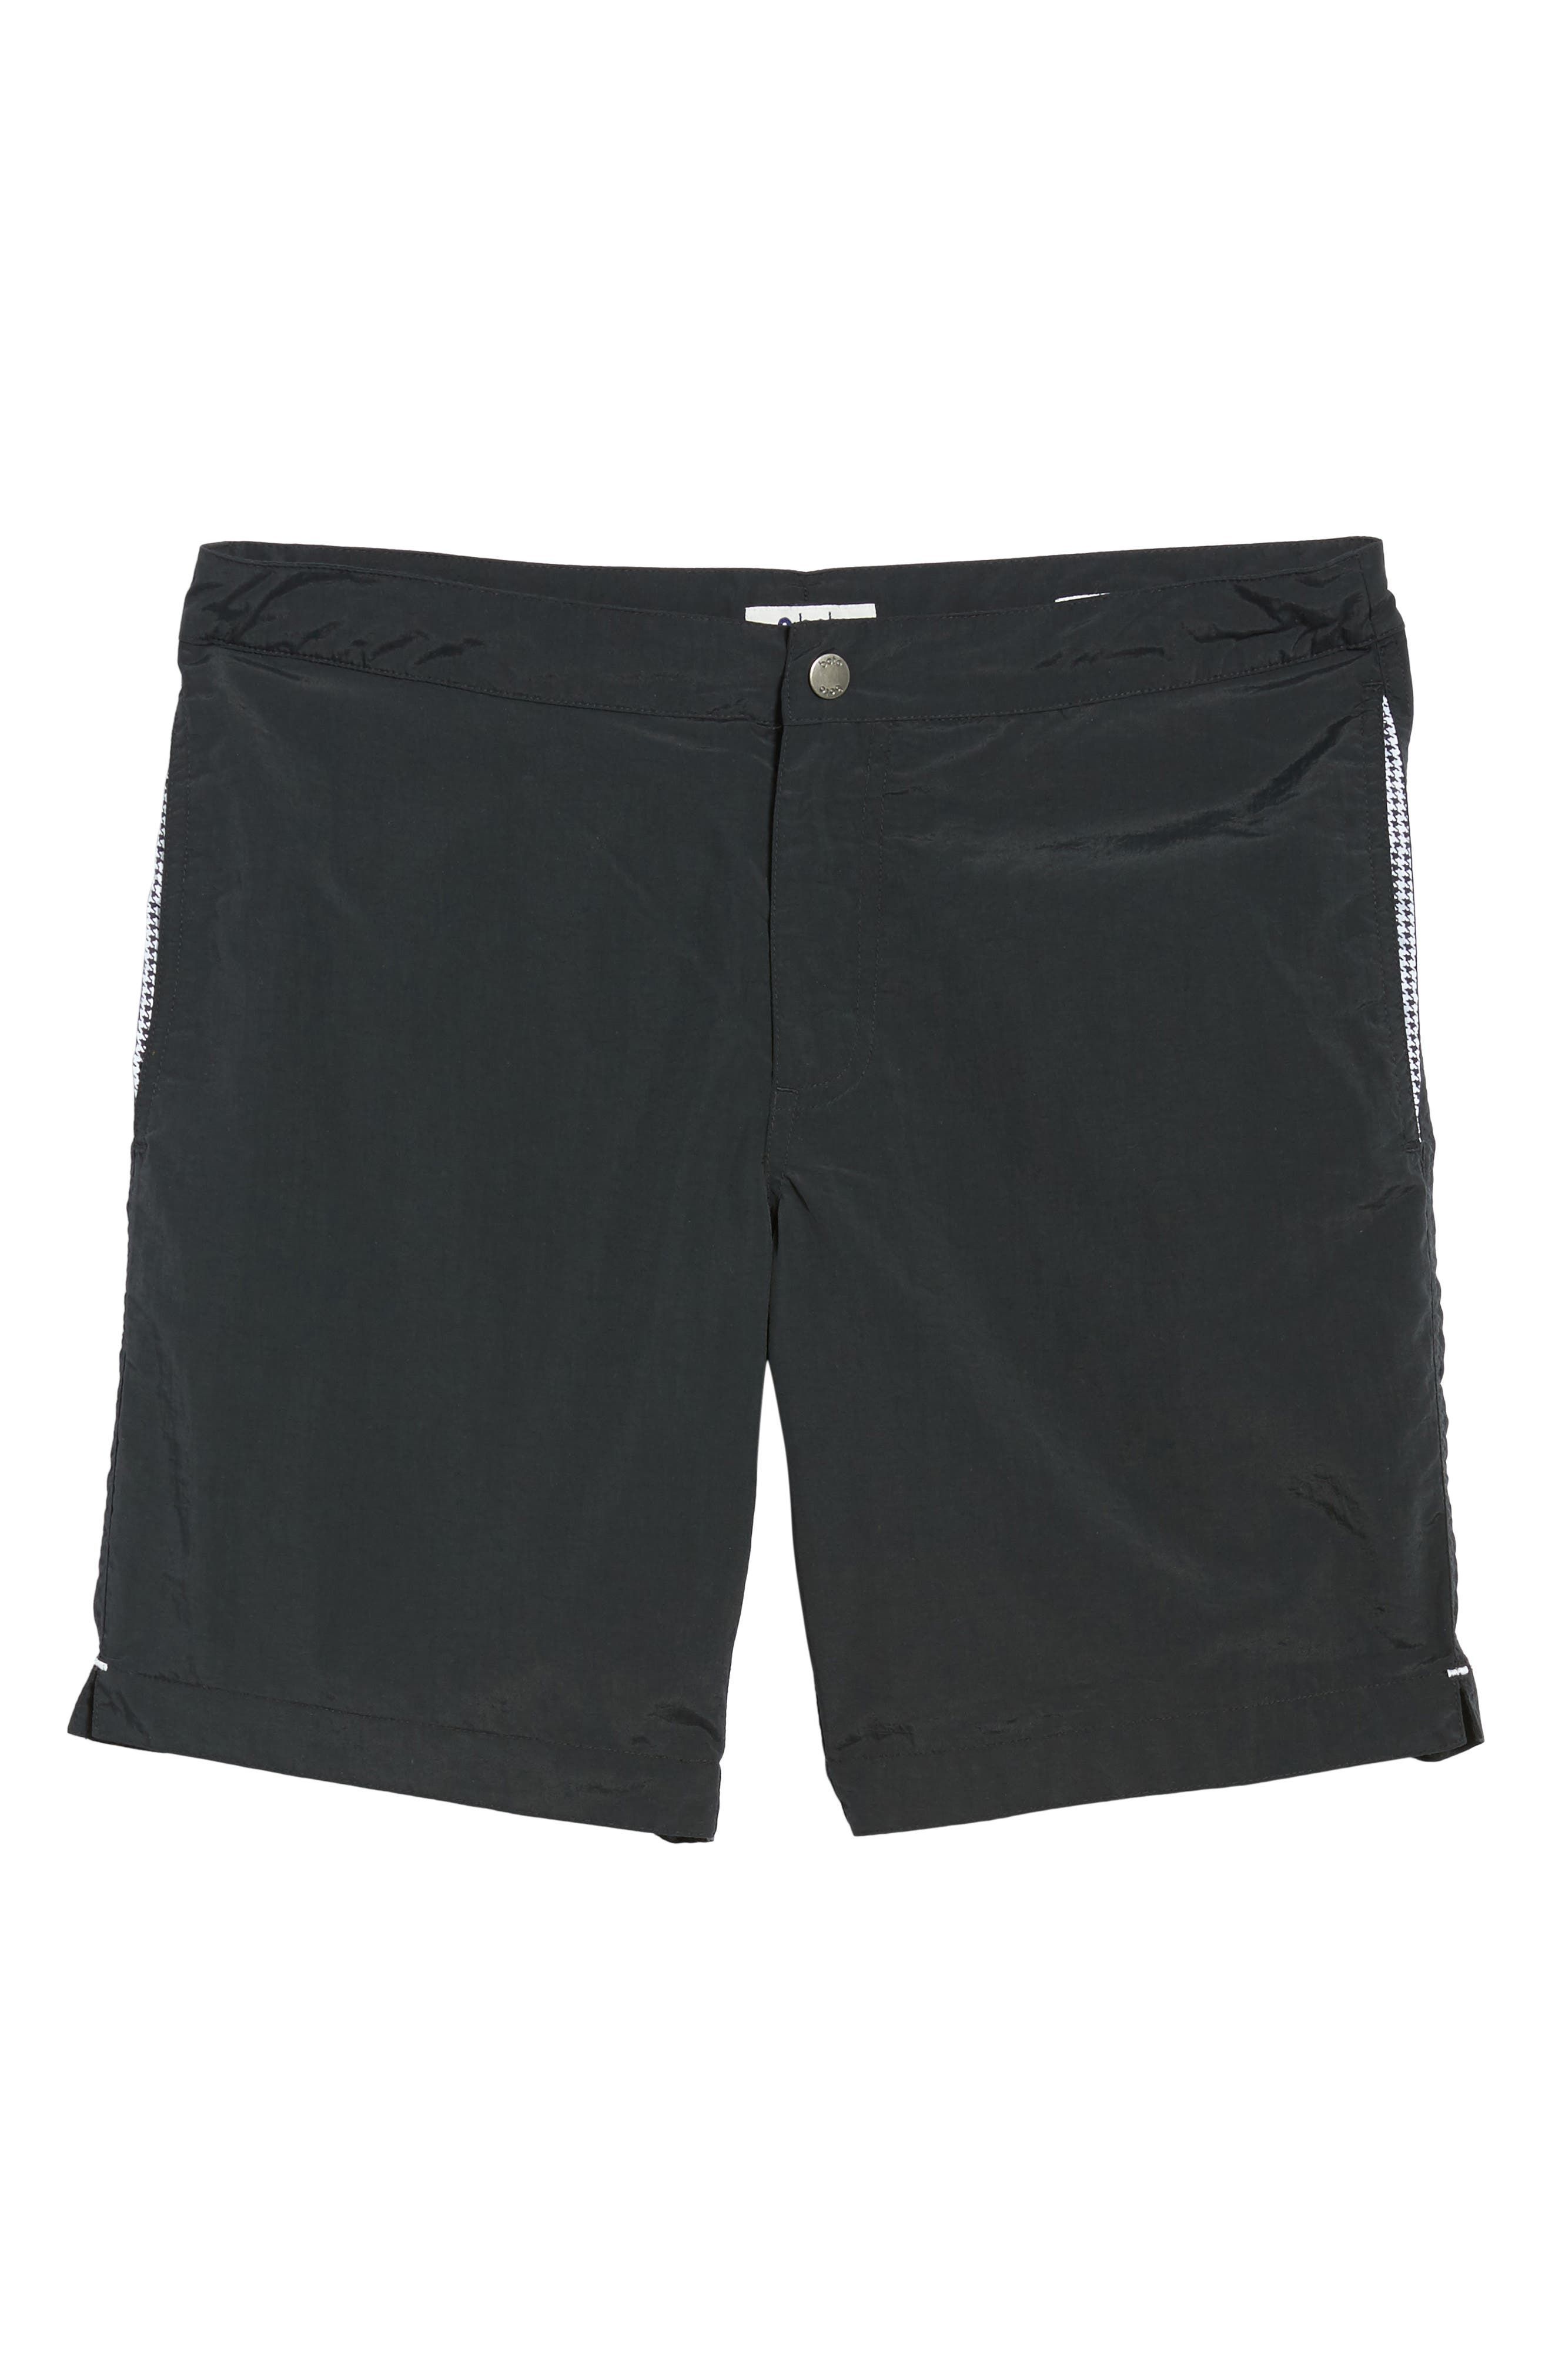 'Aruba - Island' Tailored Fit 8.5 Inch Board Shorts,                             Alternate thumbnail 6, color,                             001